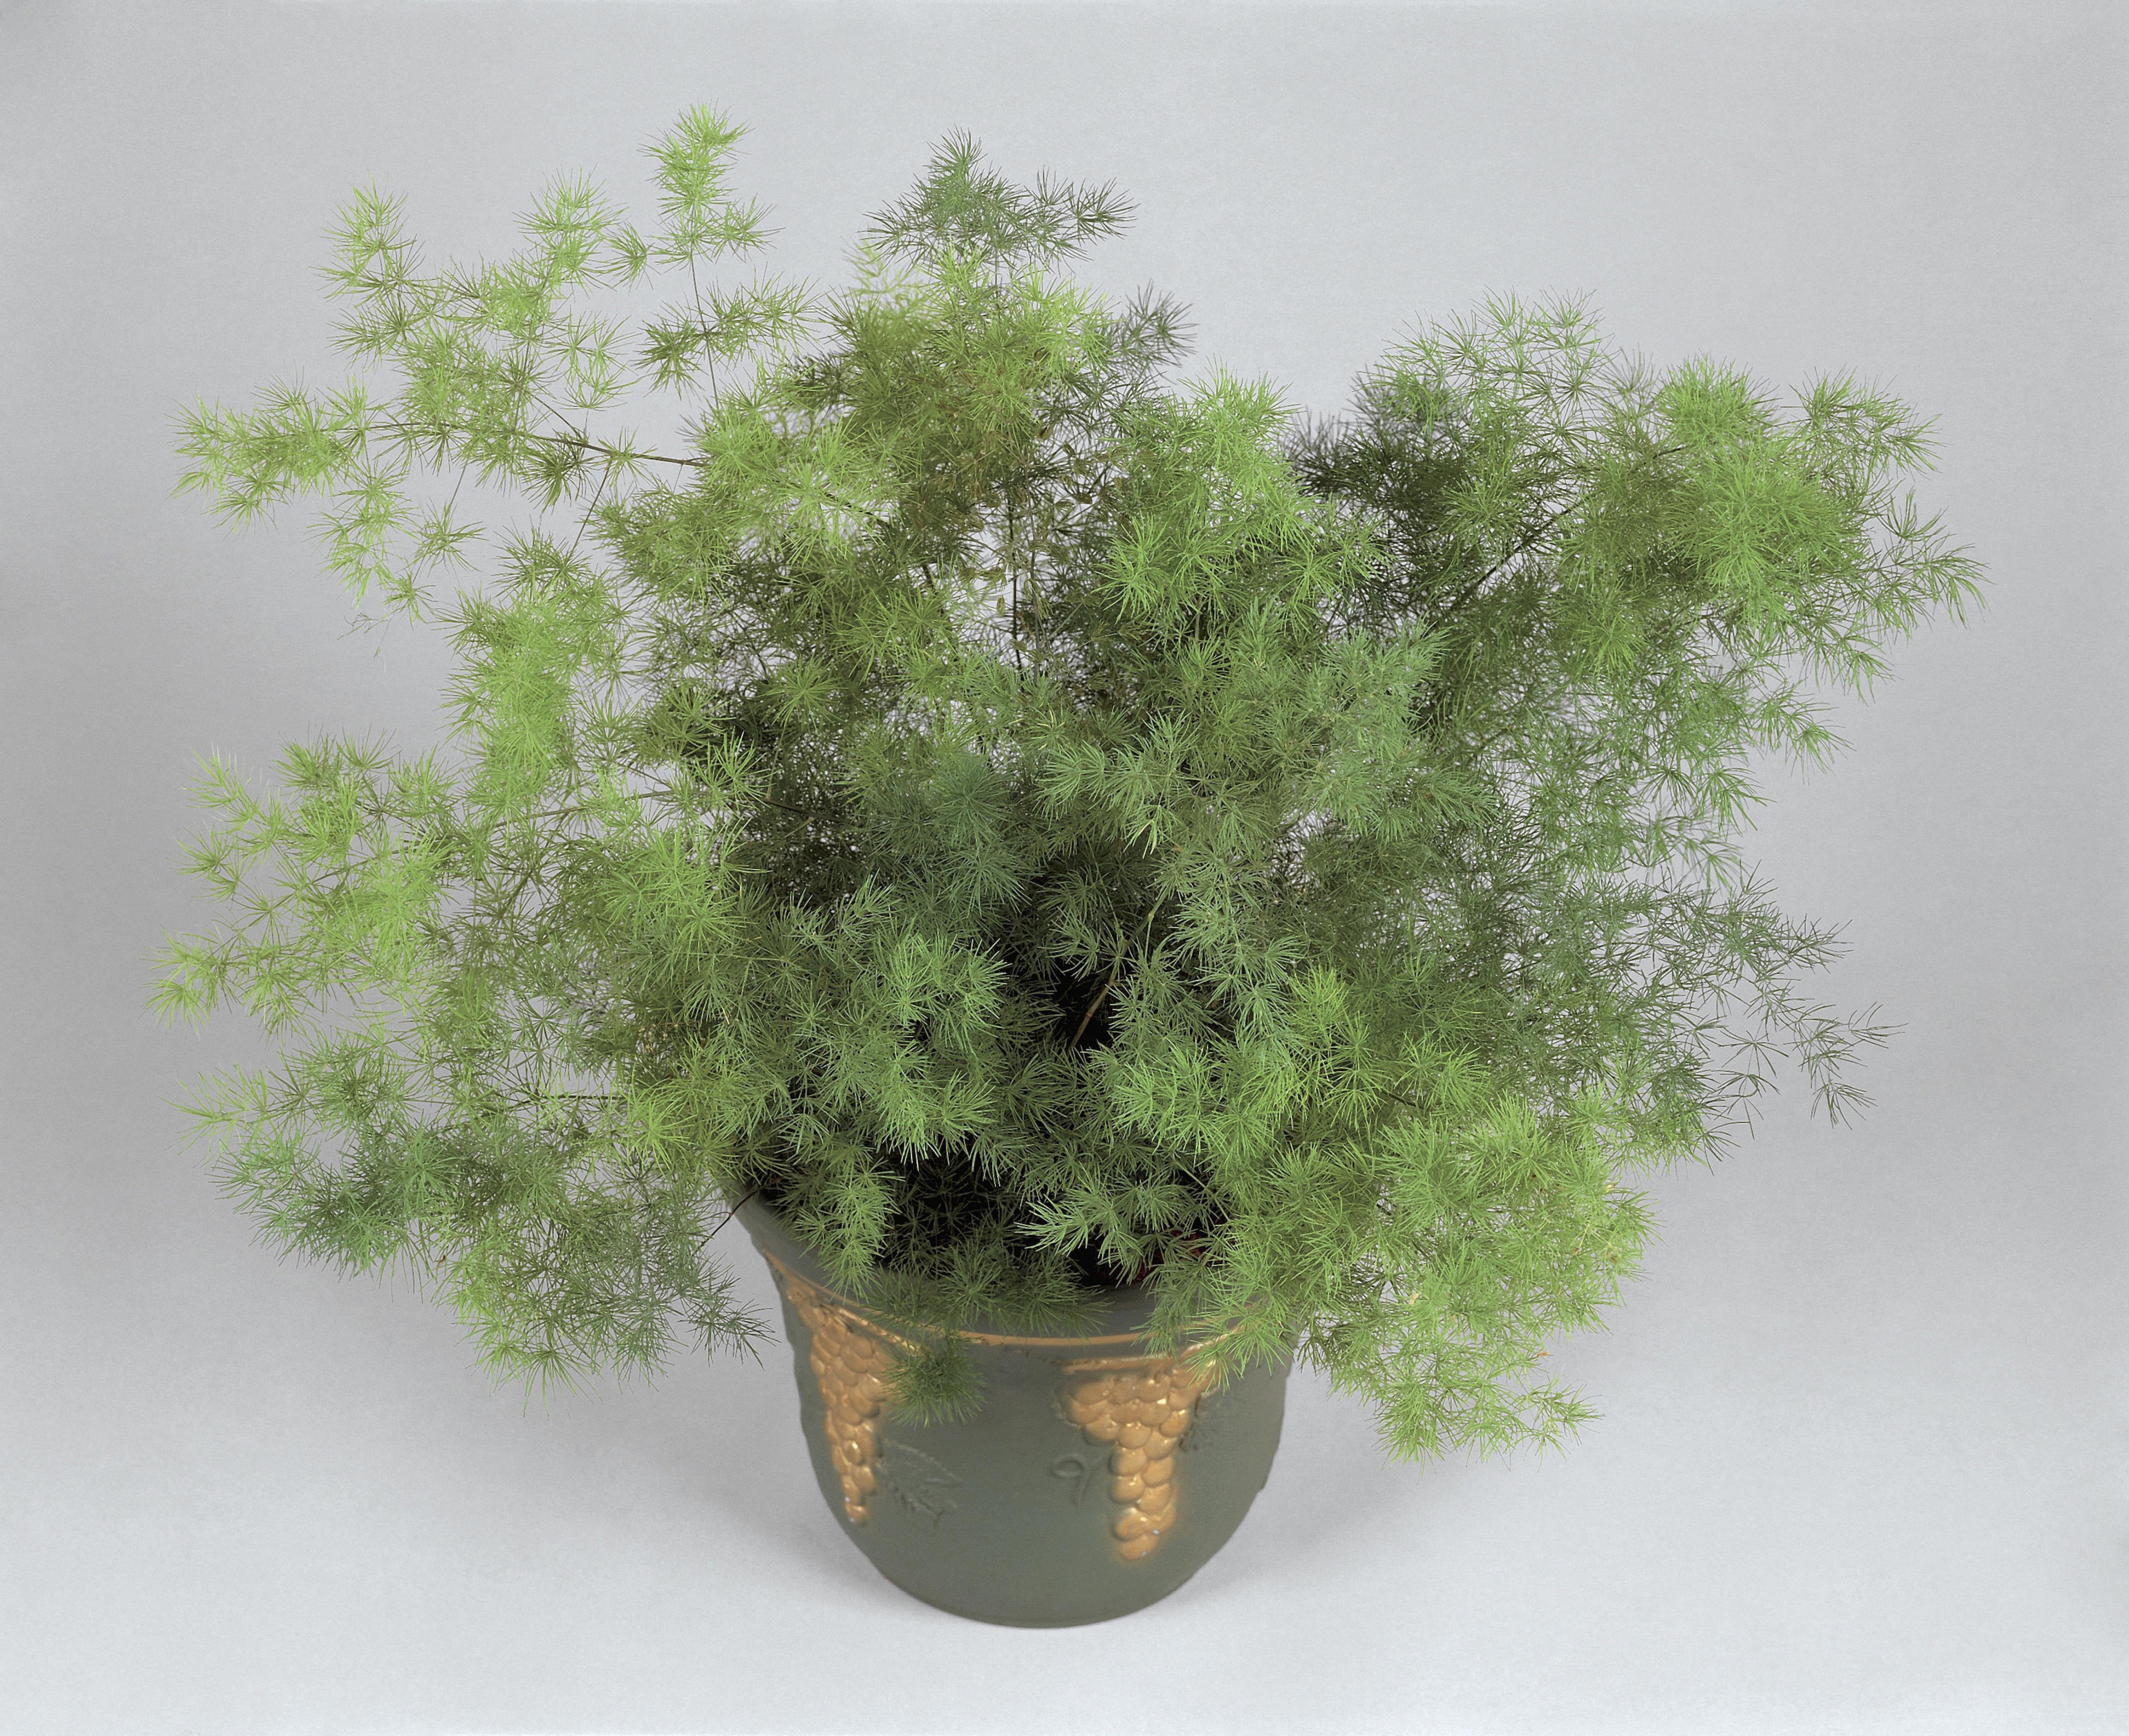 Close-up of an Asparagus Fern plant (Asparagus plumosus)